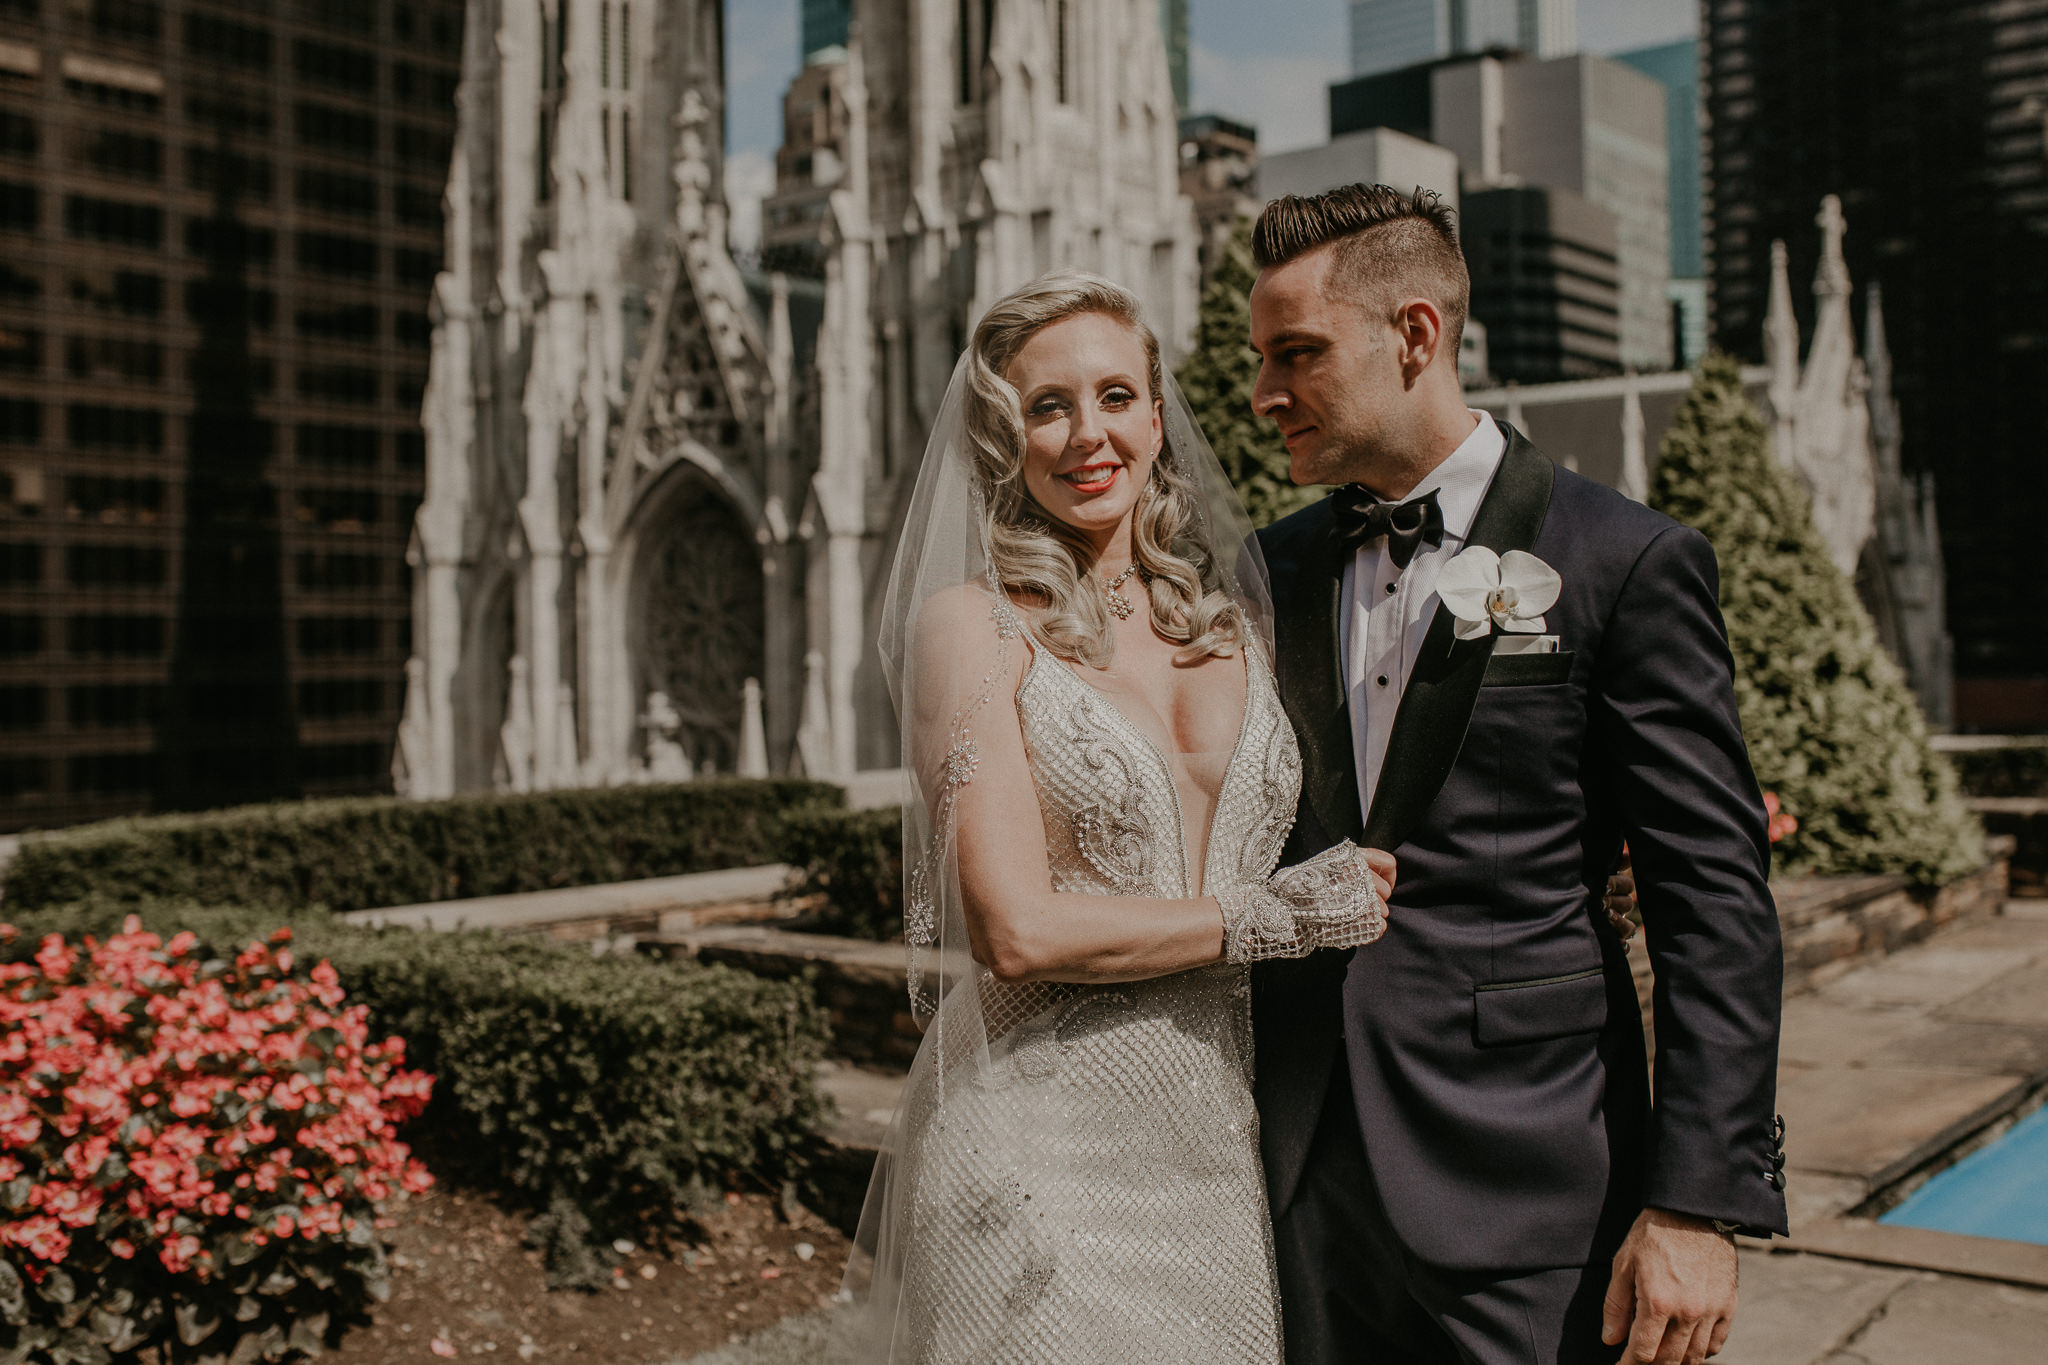 M+J_NYC_Wedding_StPatricks_30Rock_RainbowRoom_064.jpg